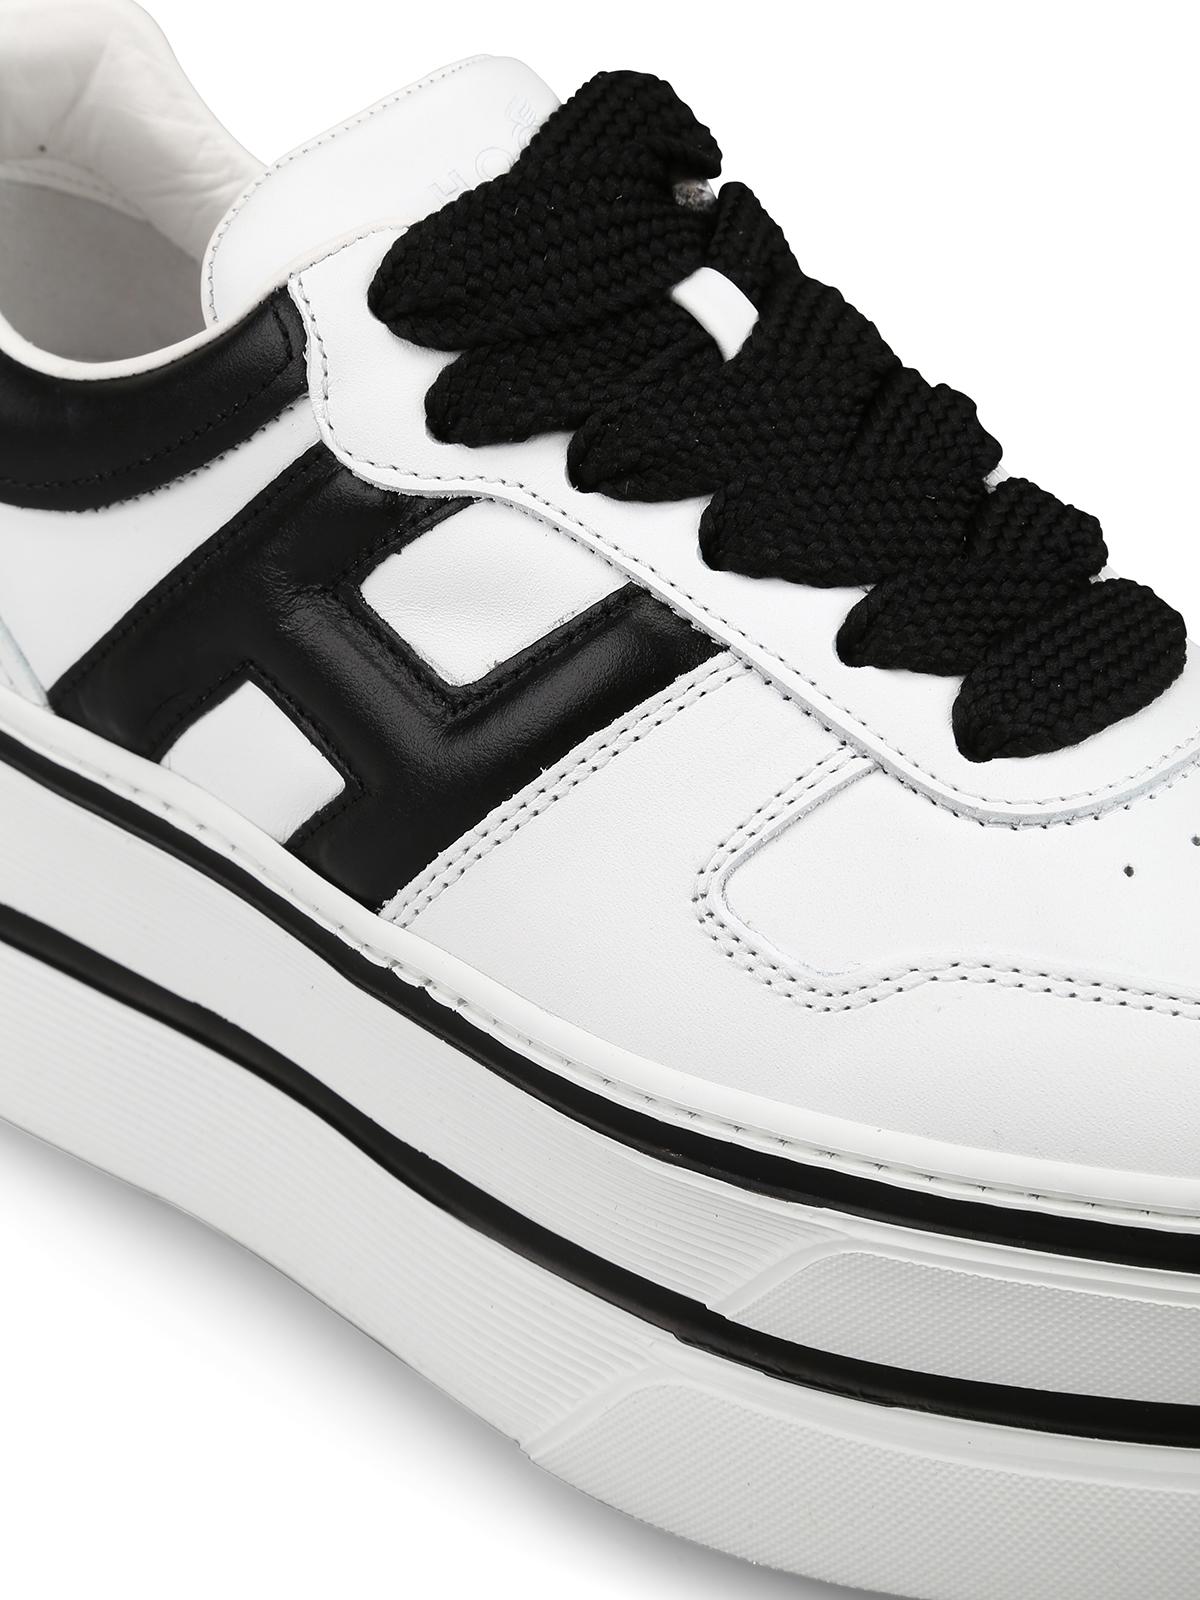 Sneakers Hogan - Sneaker H449 bianca e nera - HXW4490BS01KLA0001